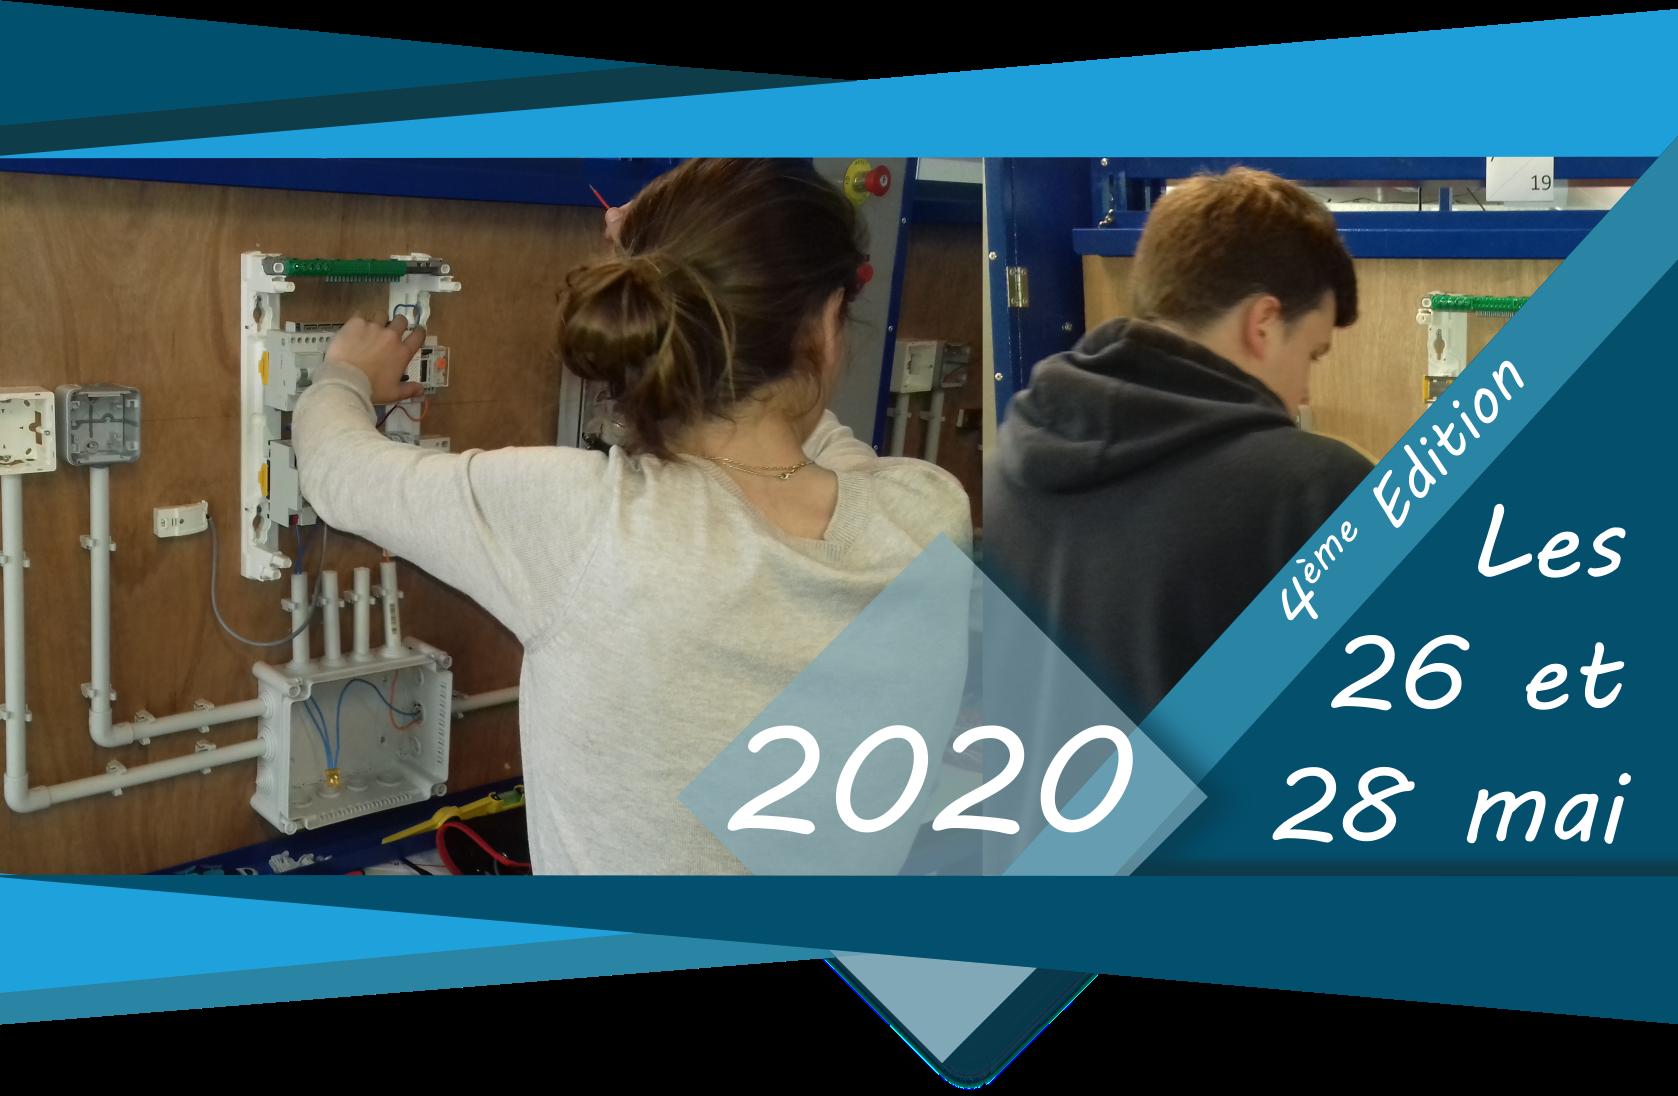 Concours MyEleec 2020 – Inscriptions ouvertes